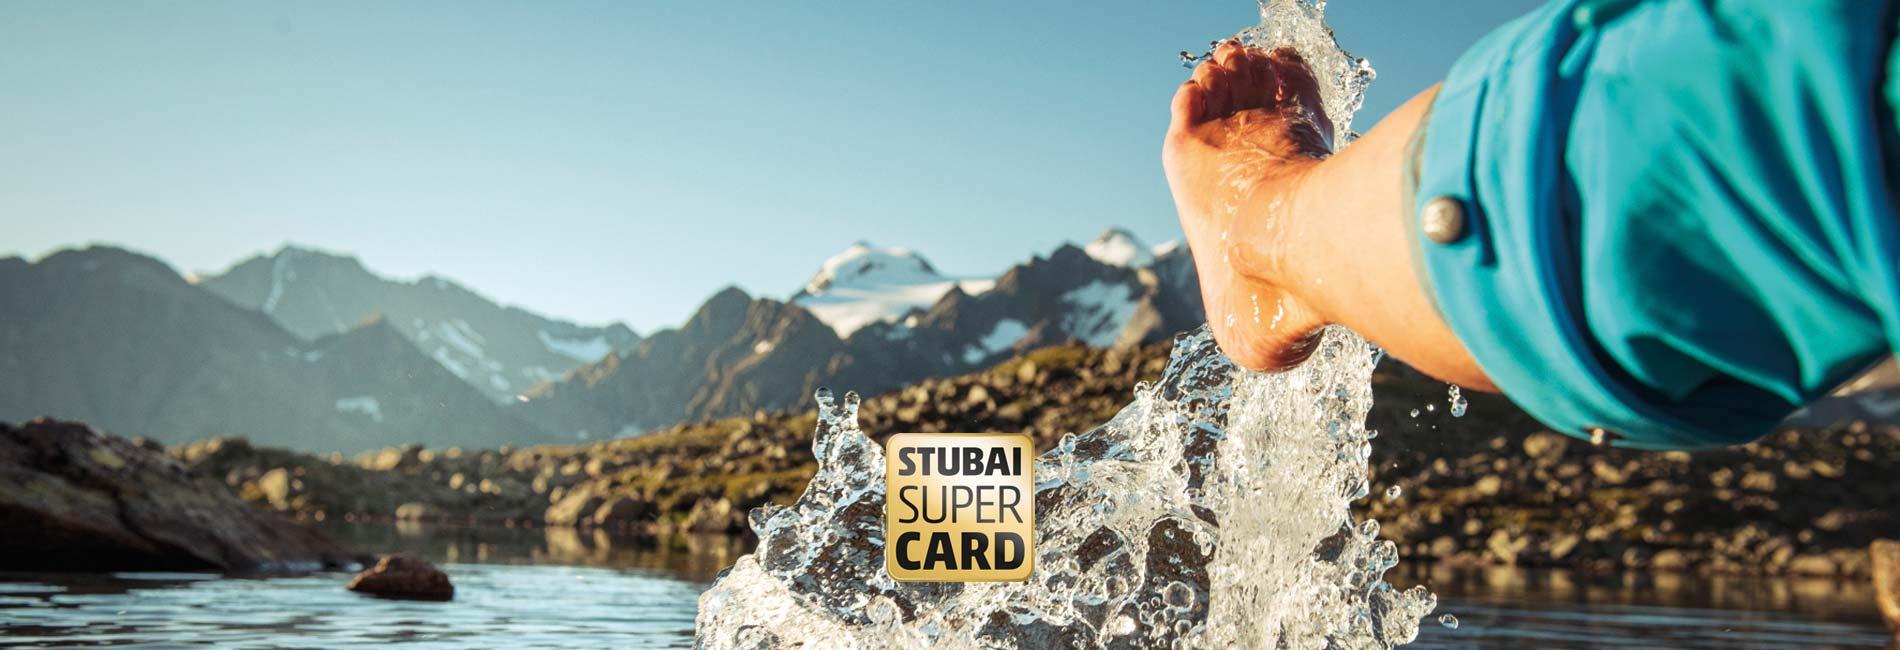 Stubai Super Card Sommerurlaub im Stubaital Hotel Almhof Neustift Milders Tirol